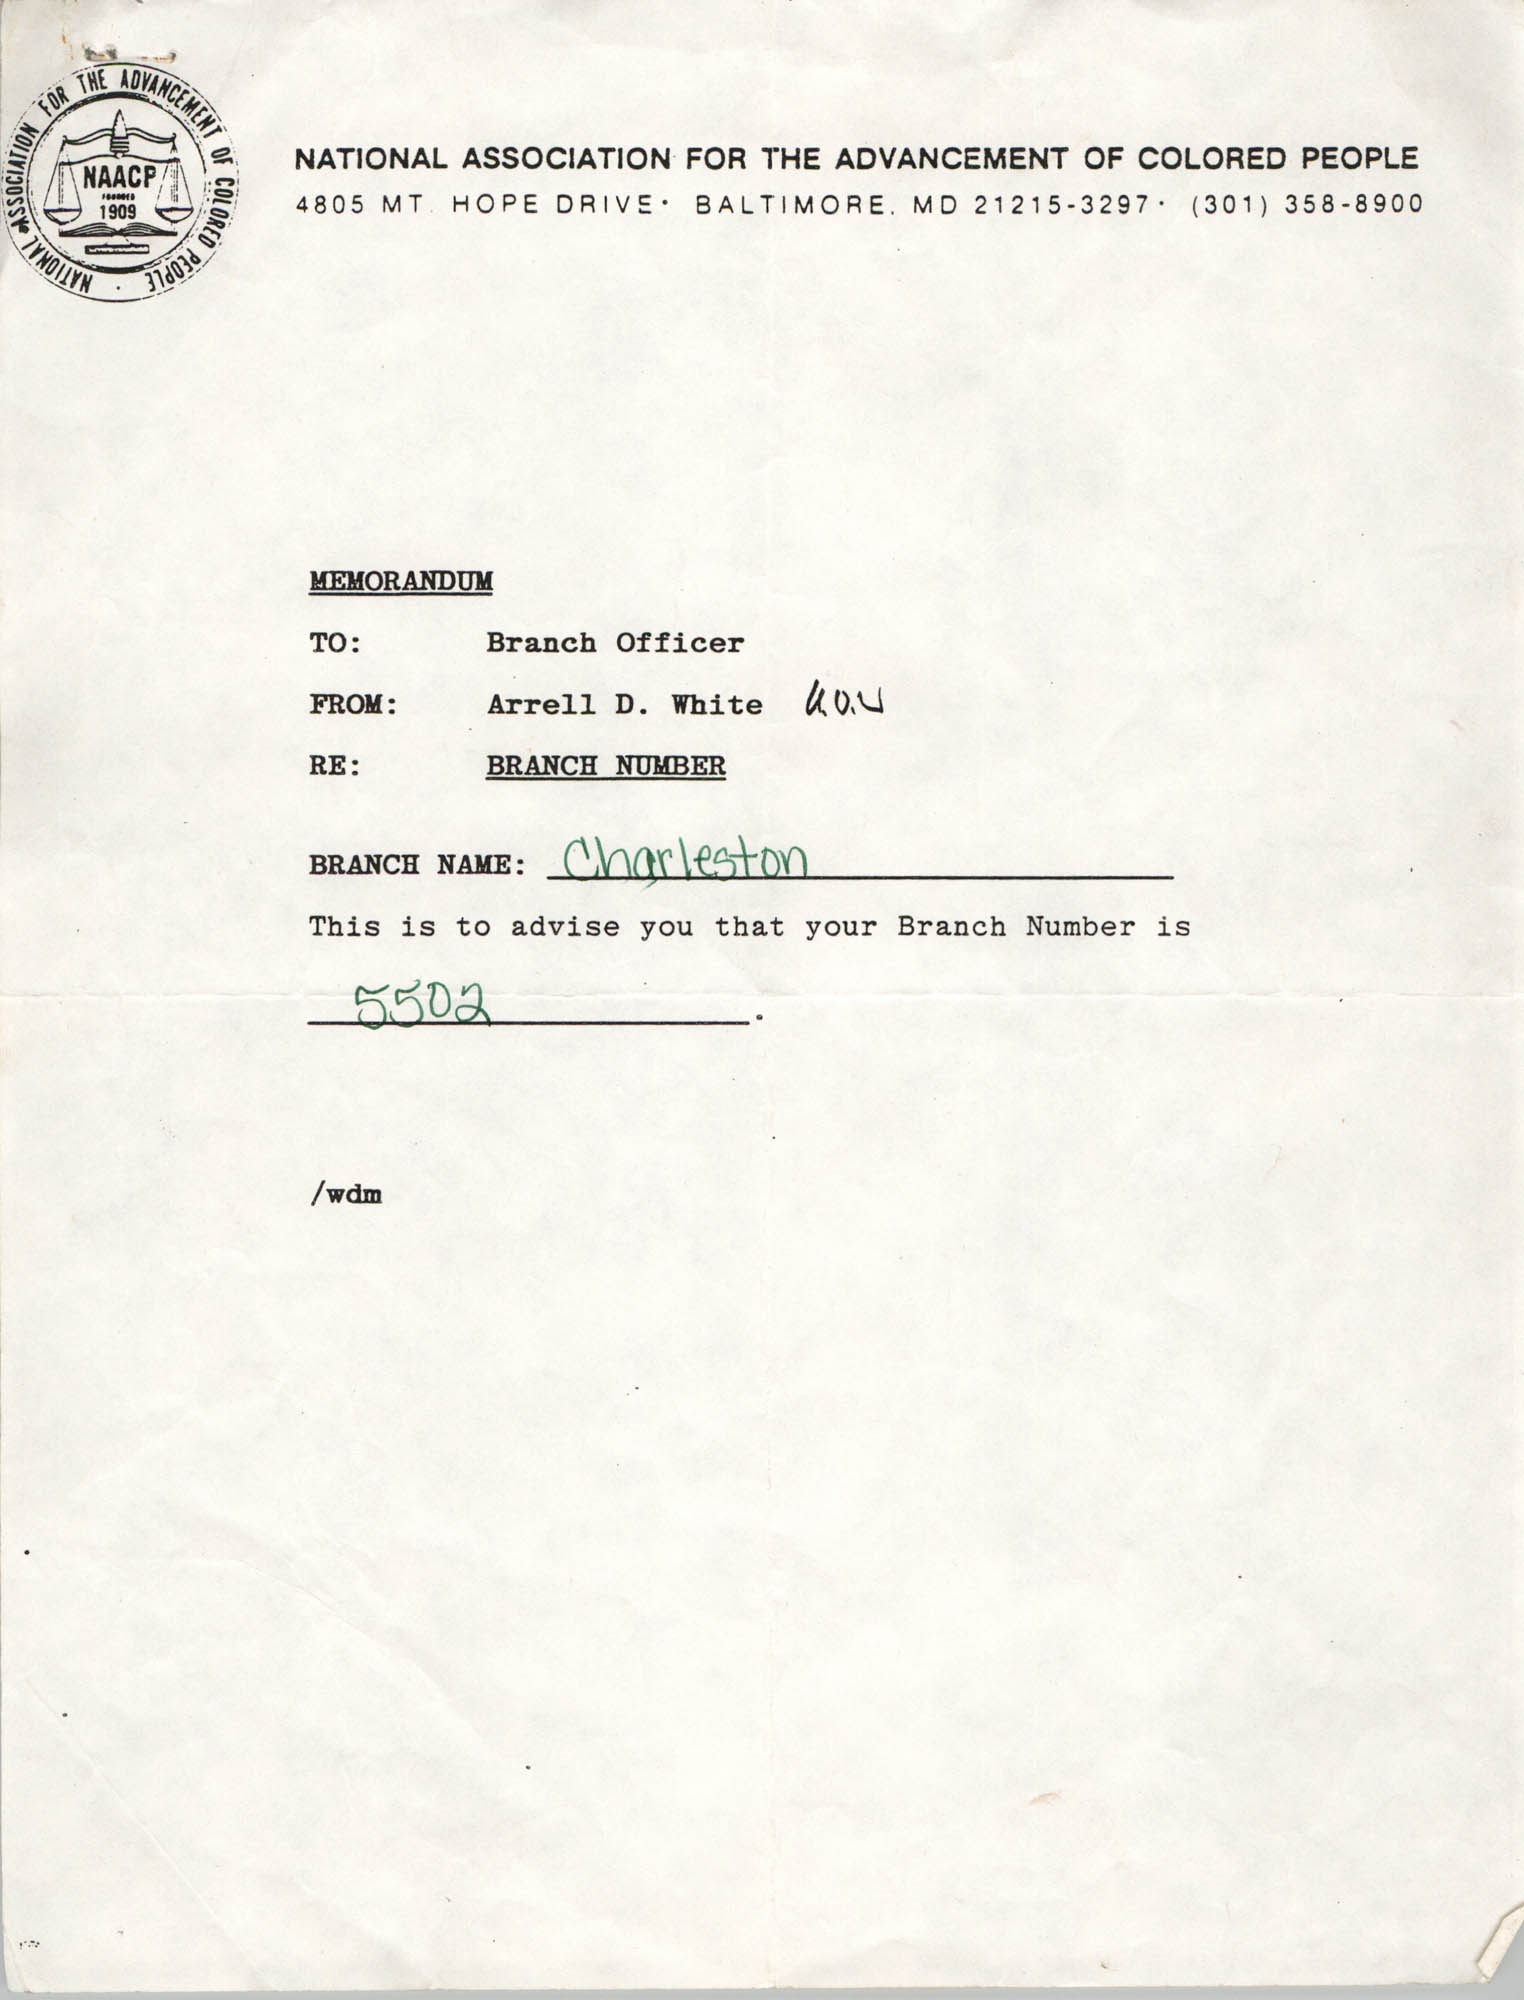 Memorandum, Arrell D. White